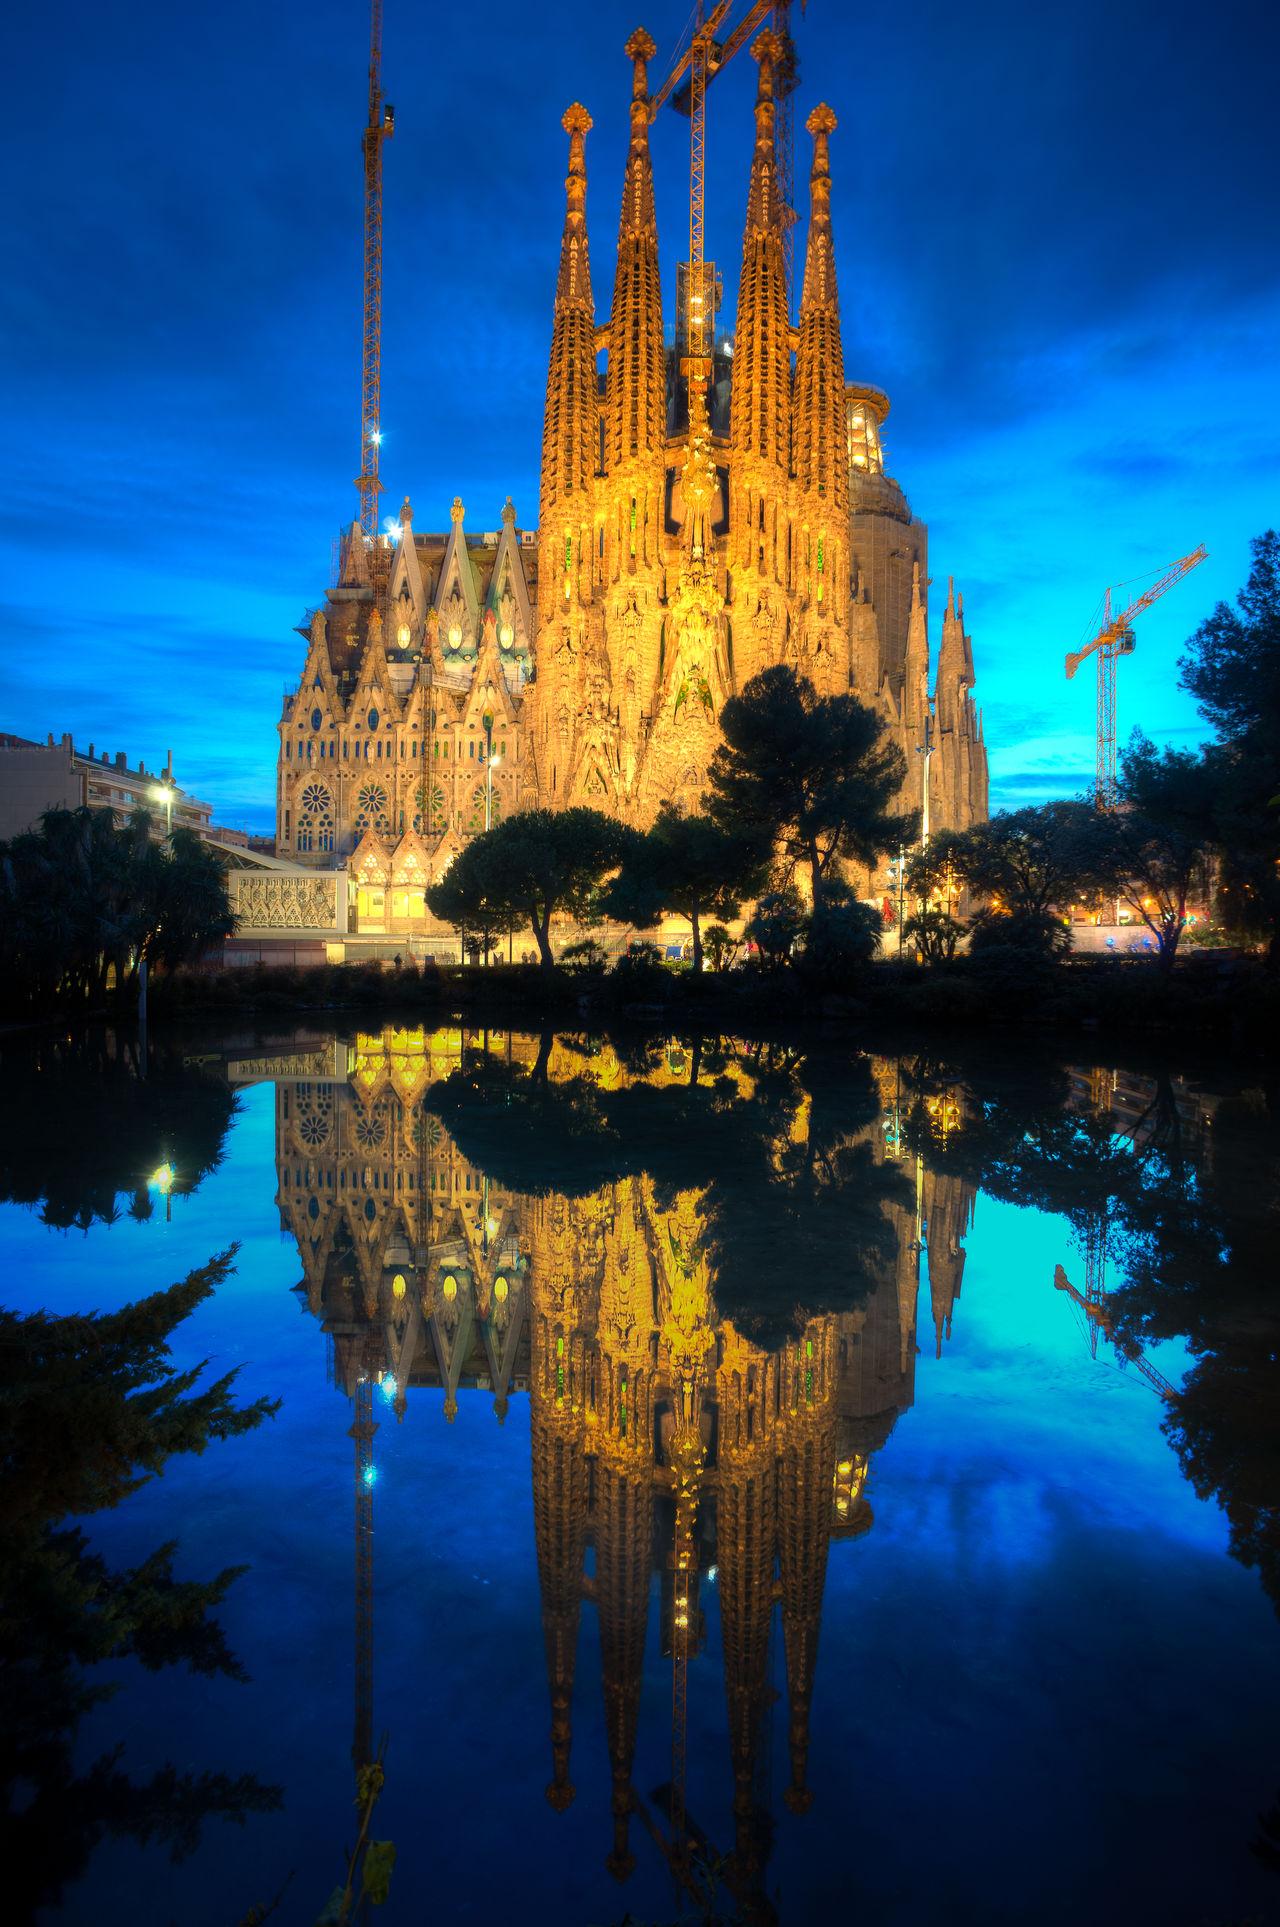 Sagrada Família Antoni Gaudí Architecture Barcelona Building Exterior Built Structure Church Gaudi Gaudi #barcelona Gaudì Architecture Work History Illuminated Night No People Outdoors Reflection Sagrada Familia Sagradafamilia Sky SPAIN Symmetry Travel Destinations Water